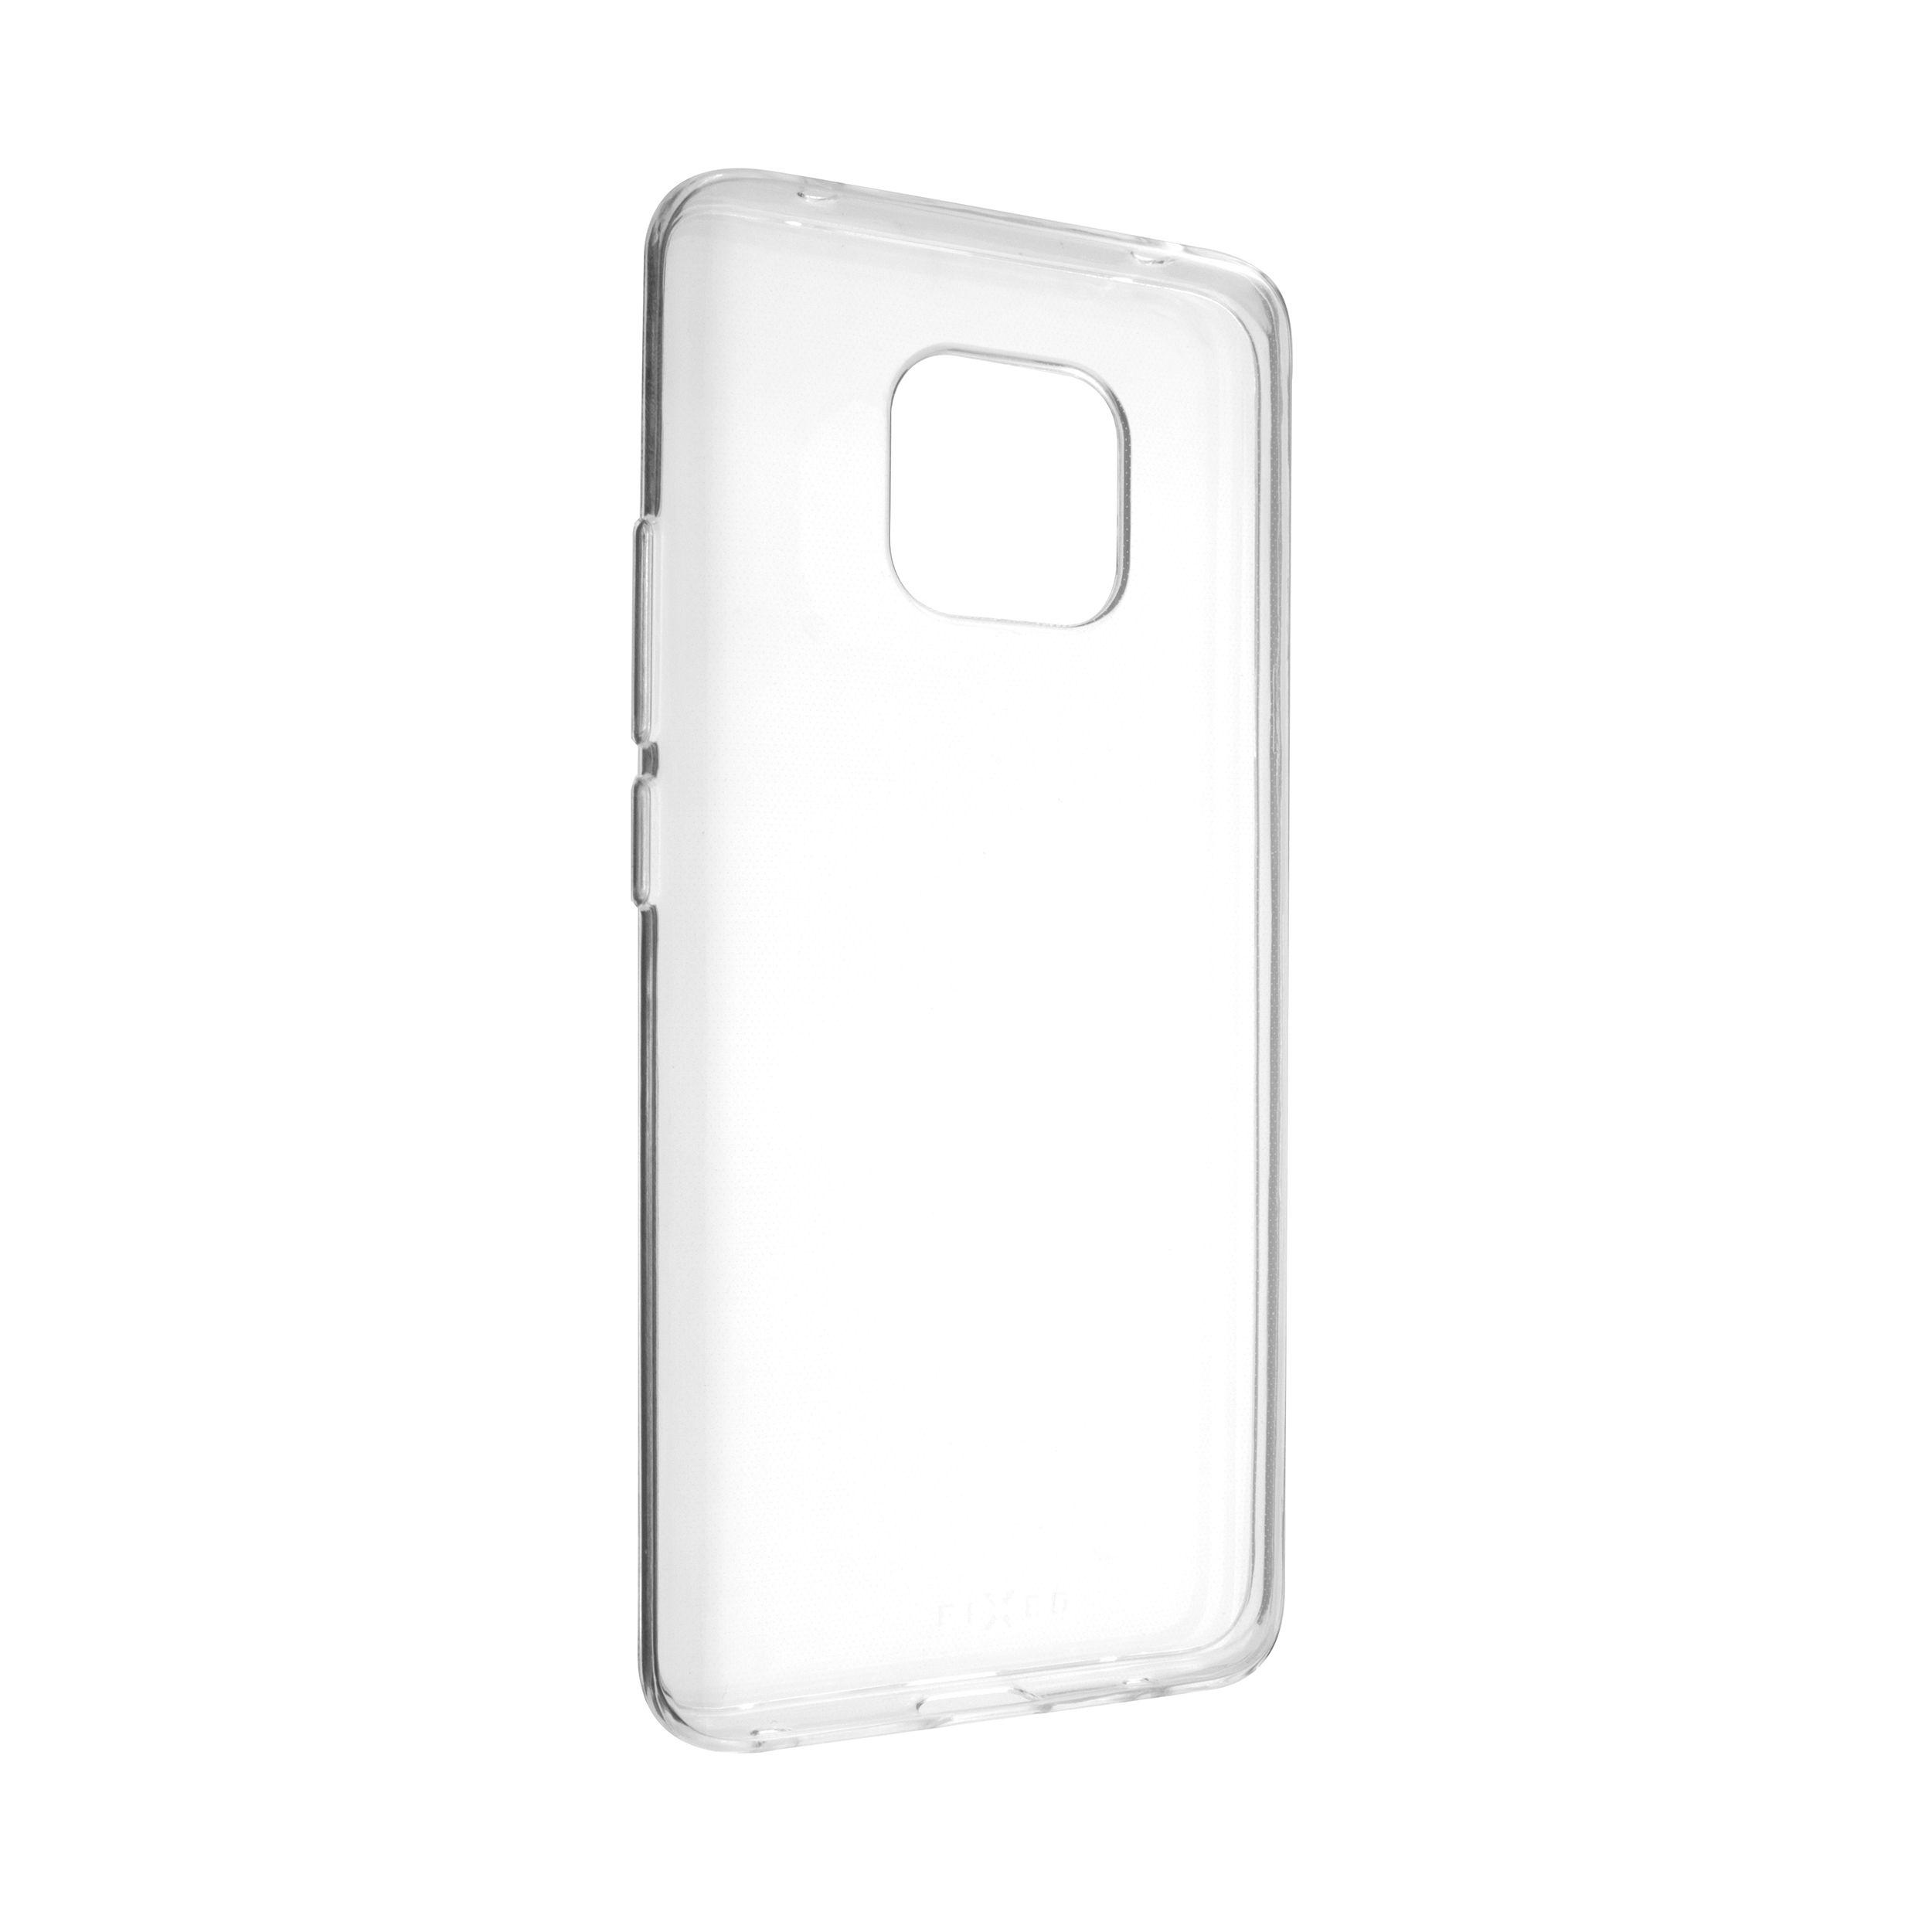 Ultratenké TPU gelové pouzdro FIXED Skin pro Huawei Mate 20 Pro, 0,6 mm, čiré